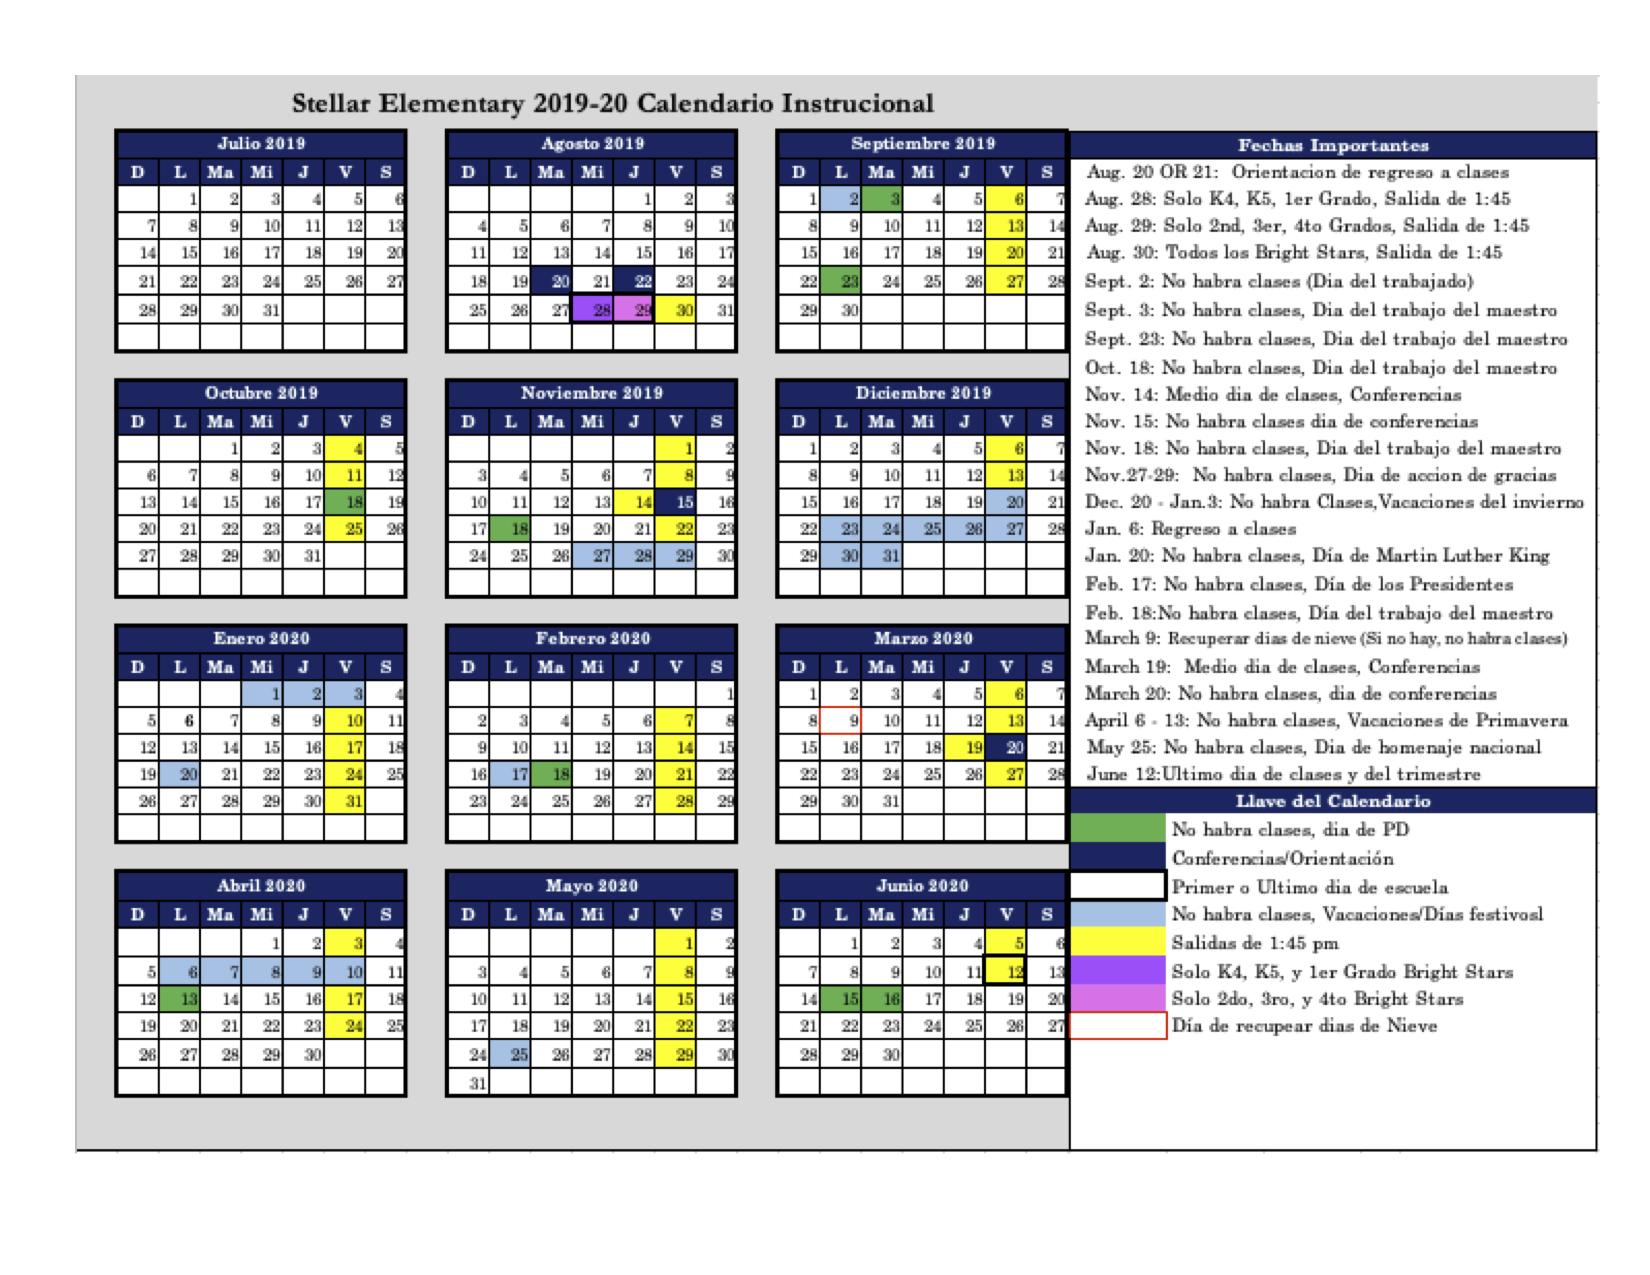 Microsoft Word - 19-20 Calendar UPDATED Spanish.png